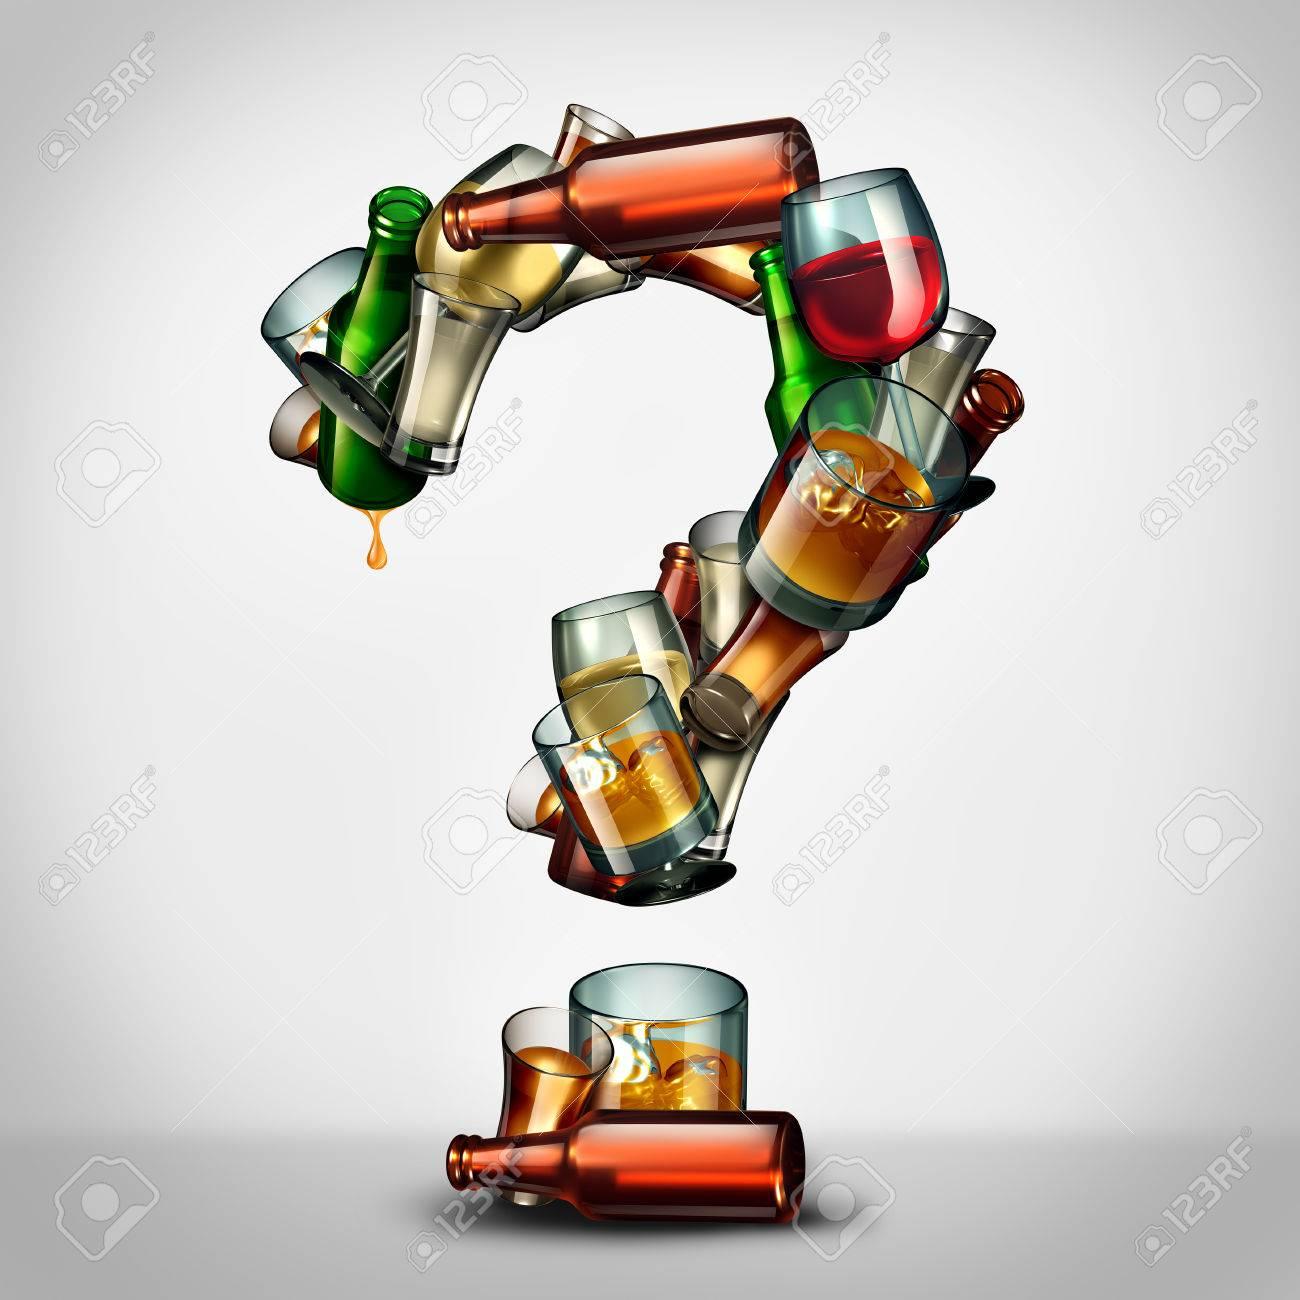 Alcohol questions and alcoholism information concept as a group alcohol questions and alcoholism information concept as a group of beer wine and hard liquor glasses buycottarizona